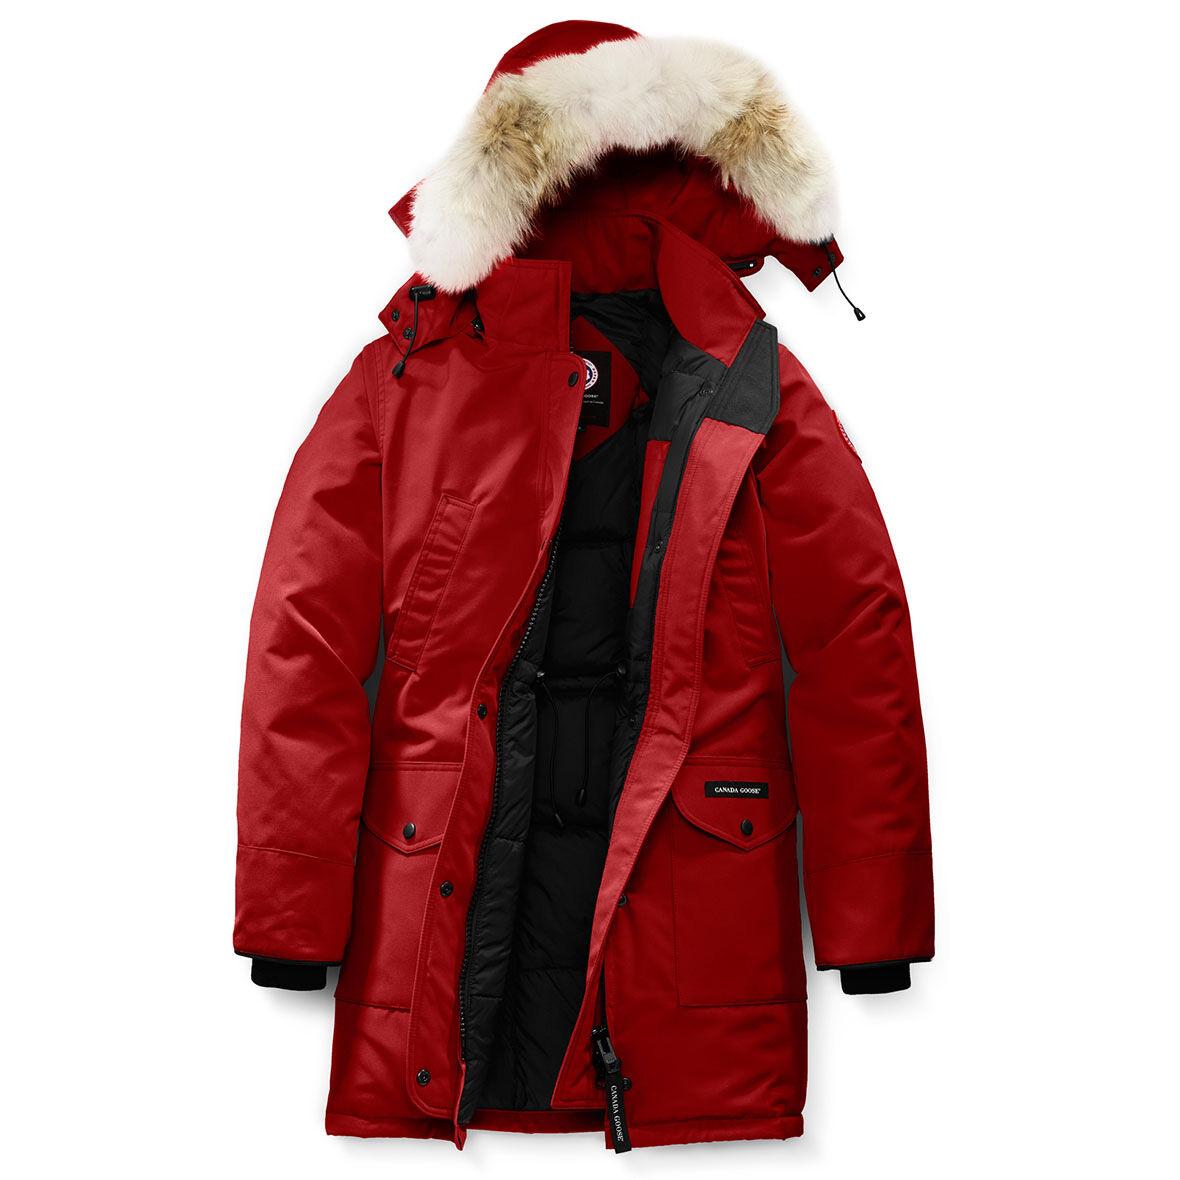 3dadaadfb cheapest canada goose jacket saskatoon games 80dcd 55620